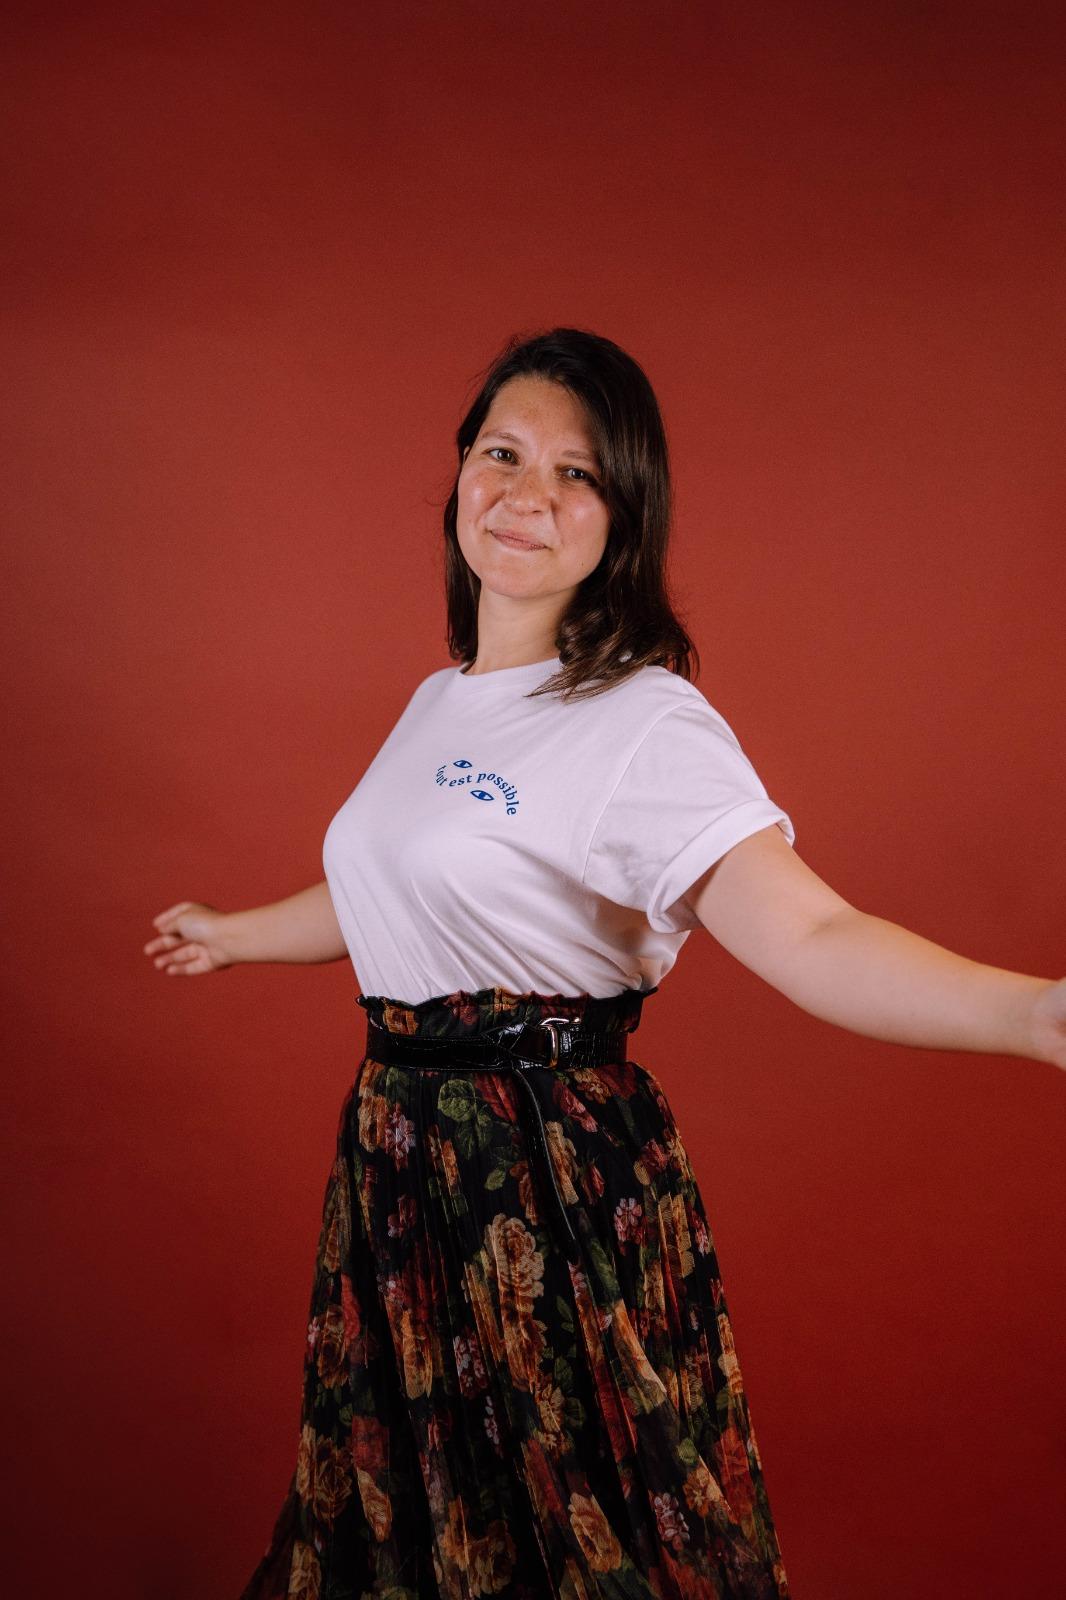 tee-shirt-wanderhumanity-tout-est-possible-ecusson-femme2